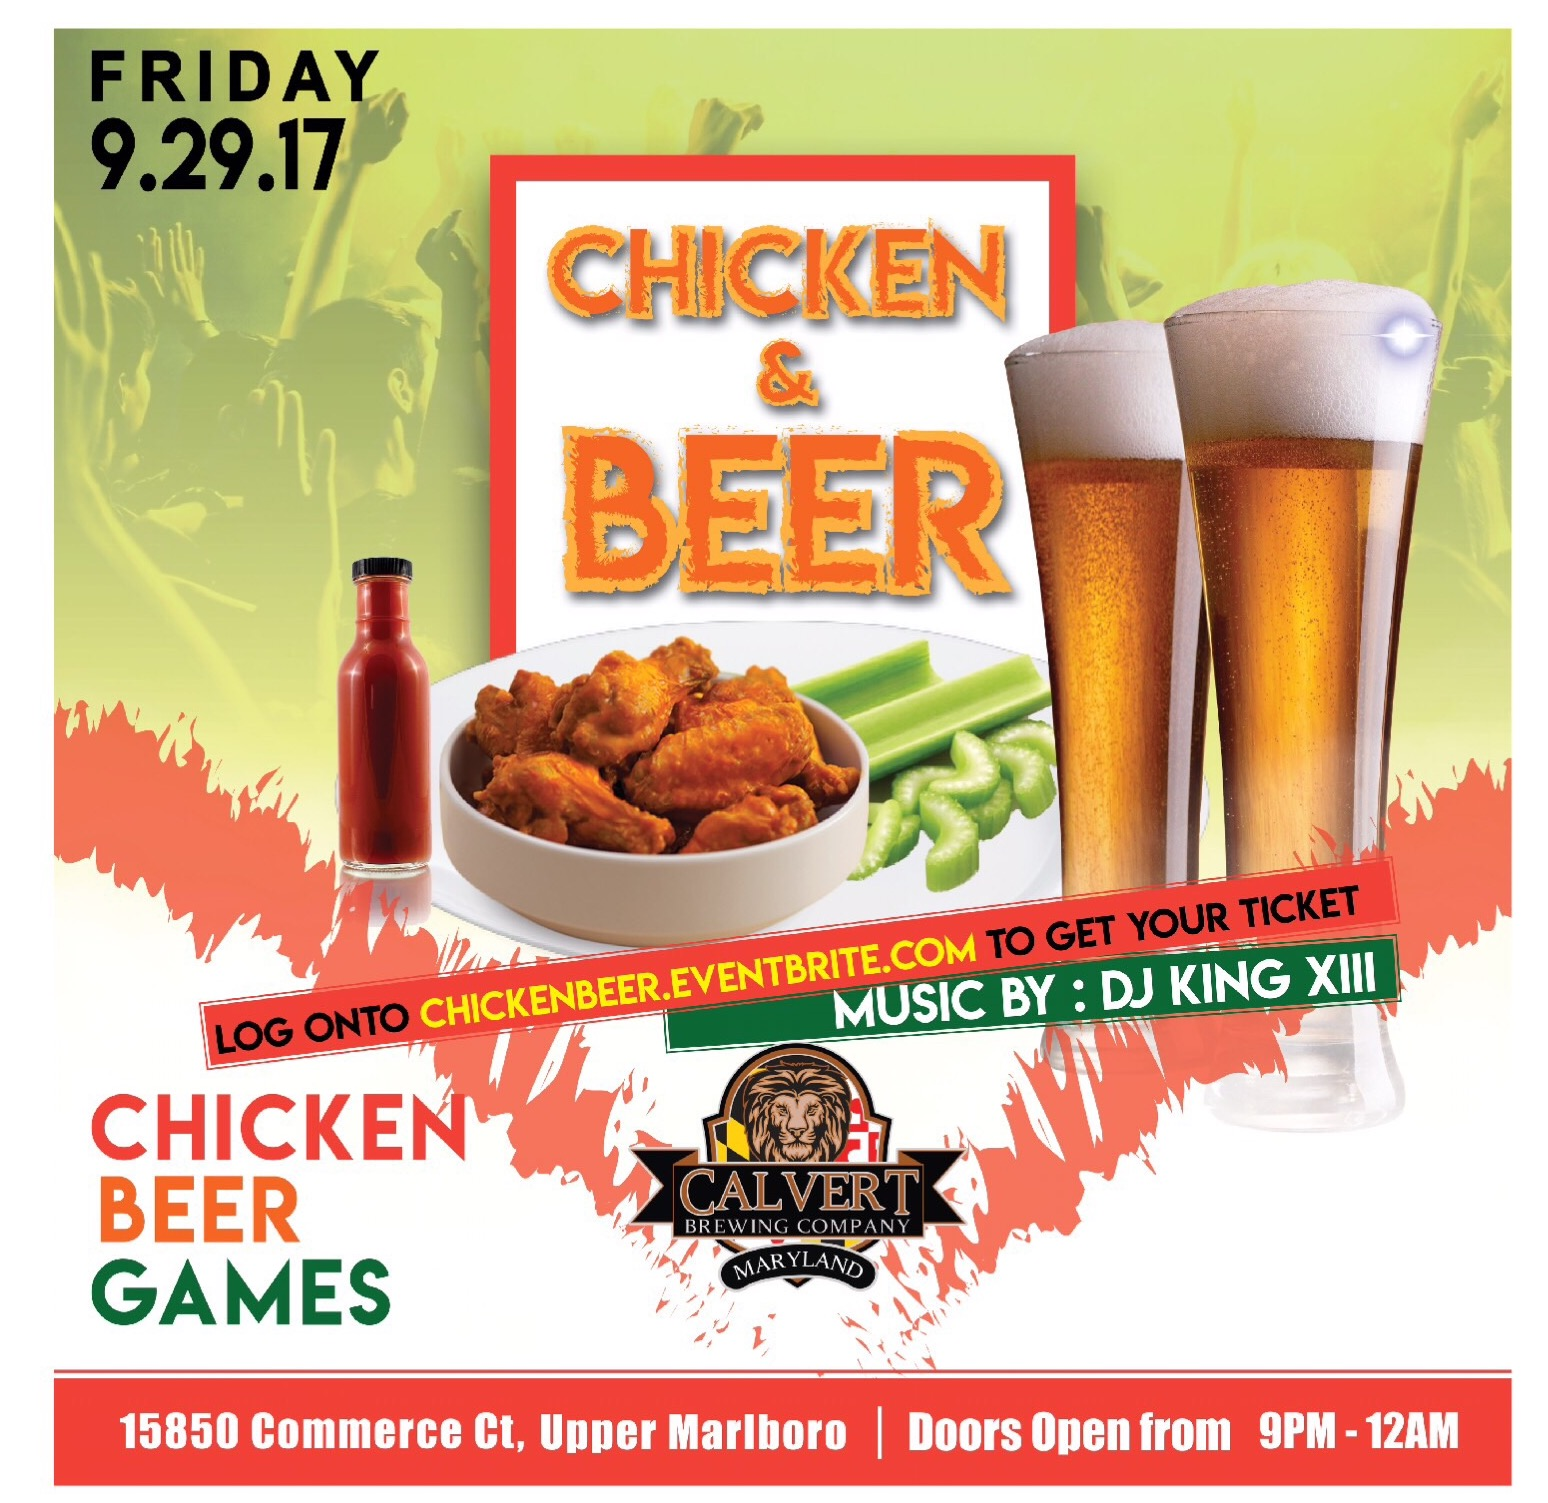 DMV.BLACK Chicken & Beer